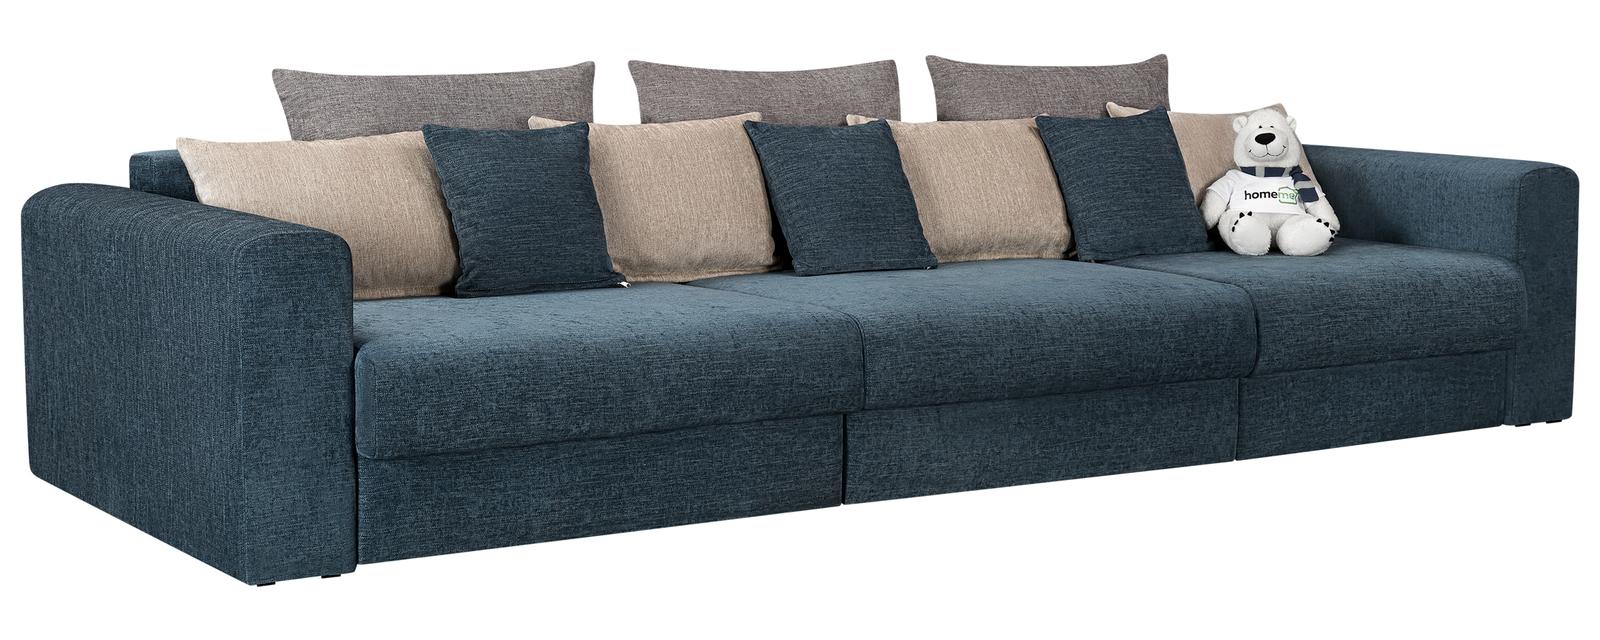 Модульный диван Медисон Вариант №1 Anabelle синий (Шенилл)